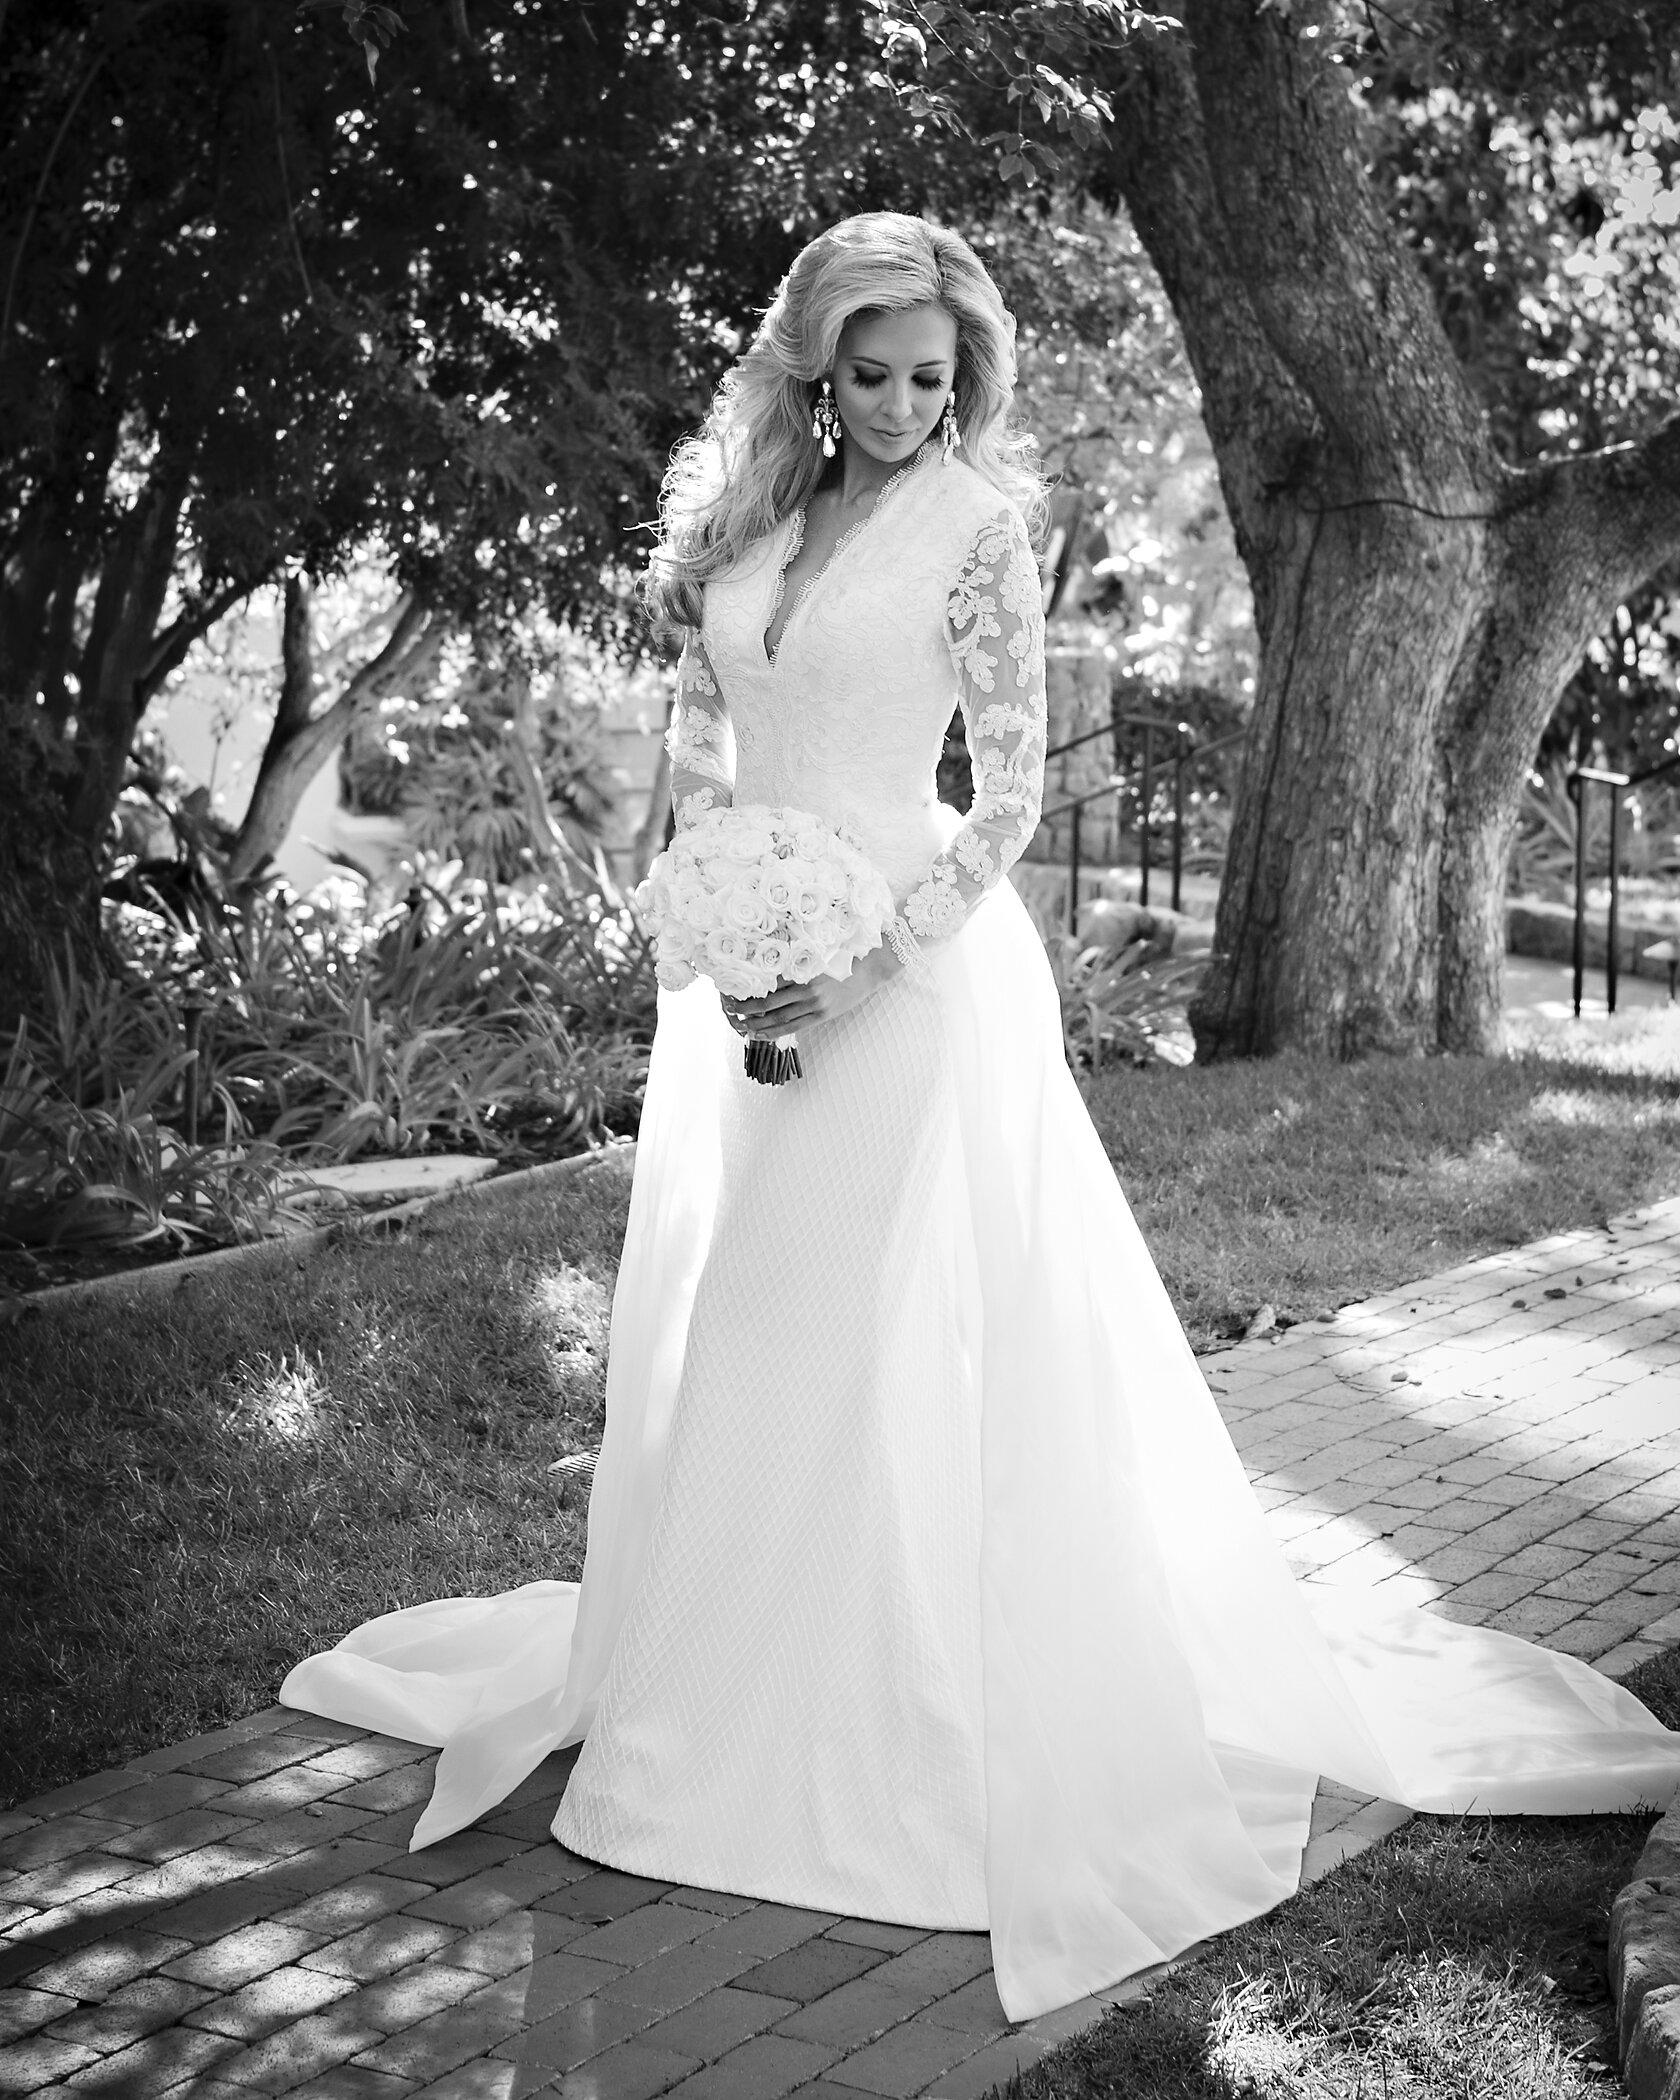 alegria-by-design-wedding-planner-planning-event-design-coordinator-day-of-belmond-el-encanto-lily-pond-garden-ceremony-formal-black-tie (1).jpg